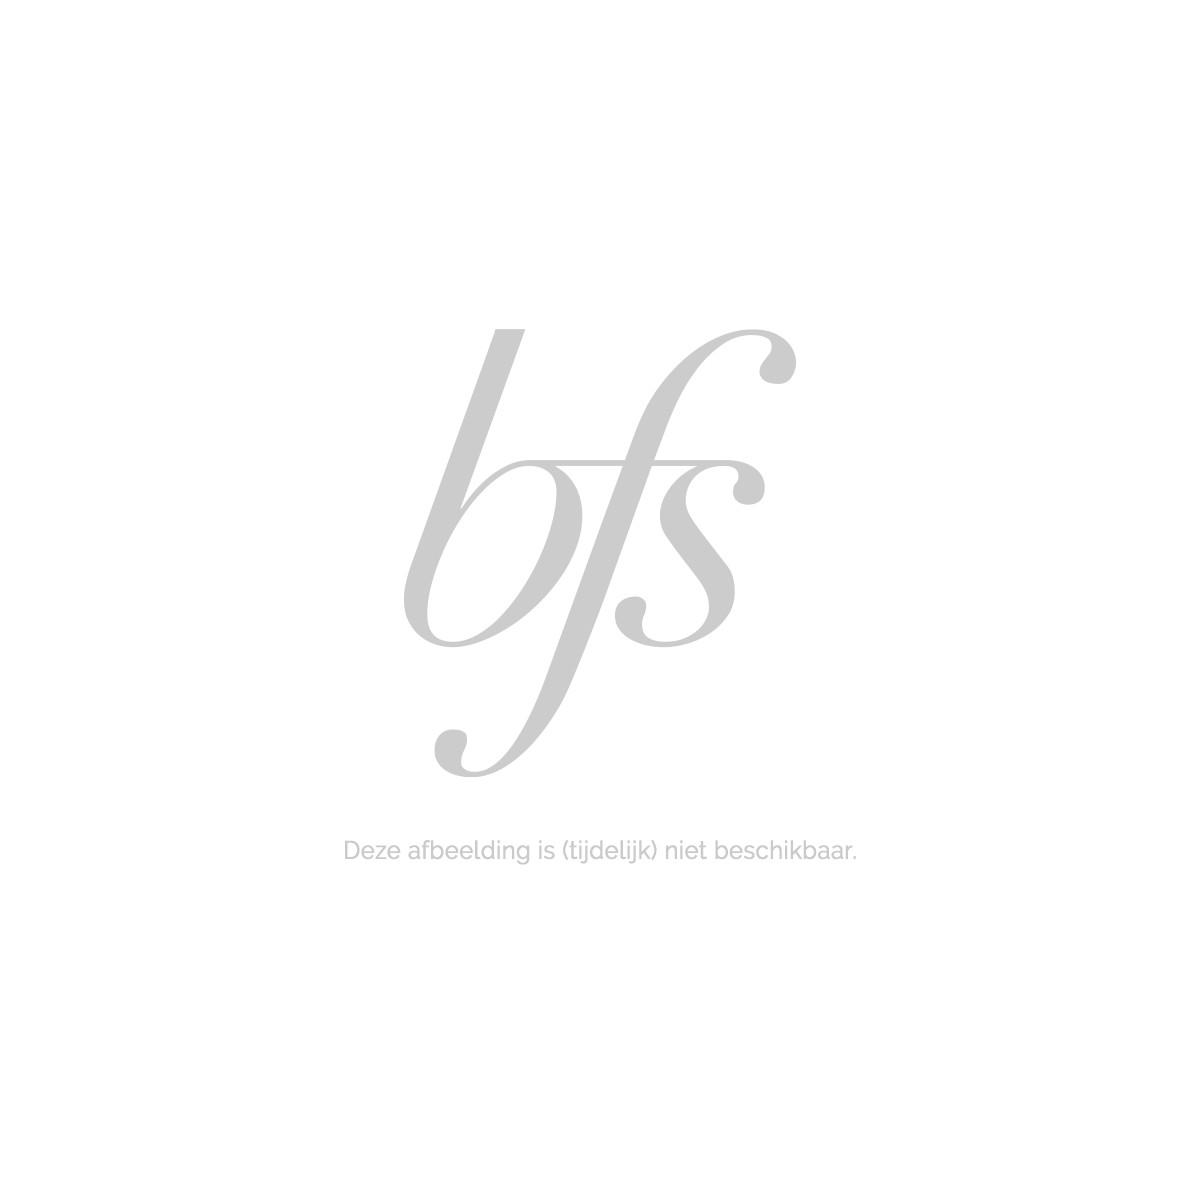 Hildegard Braukmann Sun and Care Aloe Vera Körperlotion SPF 10